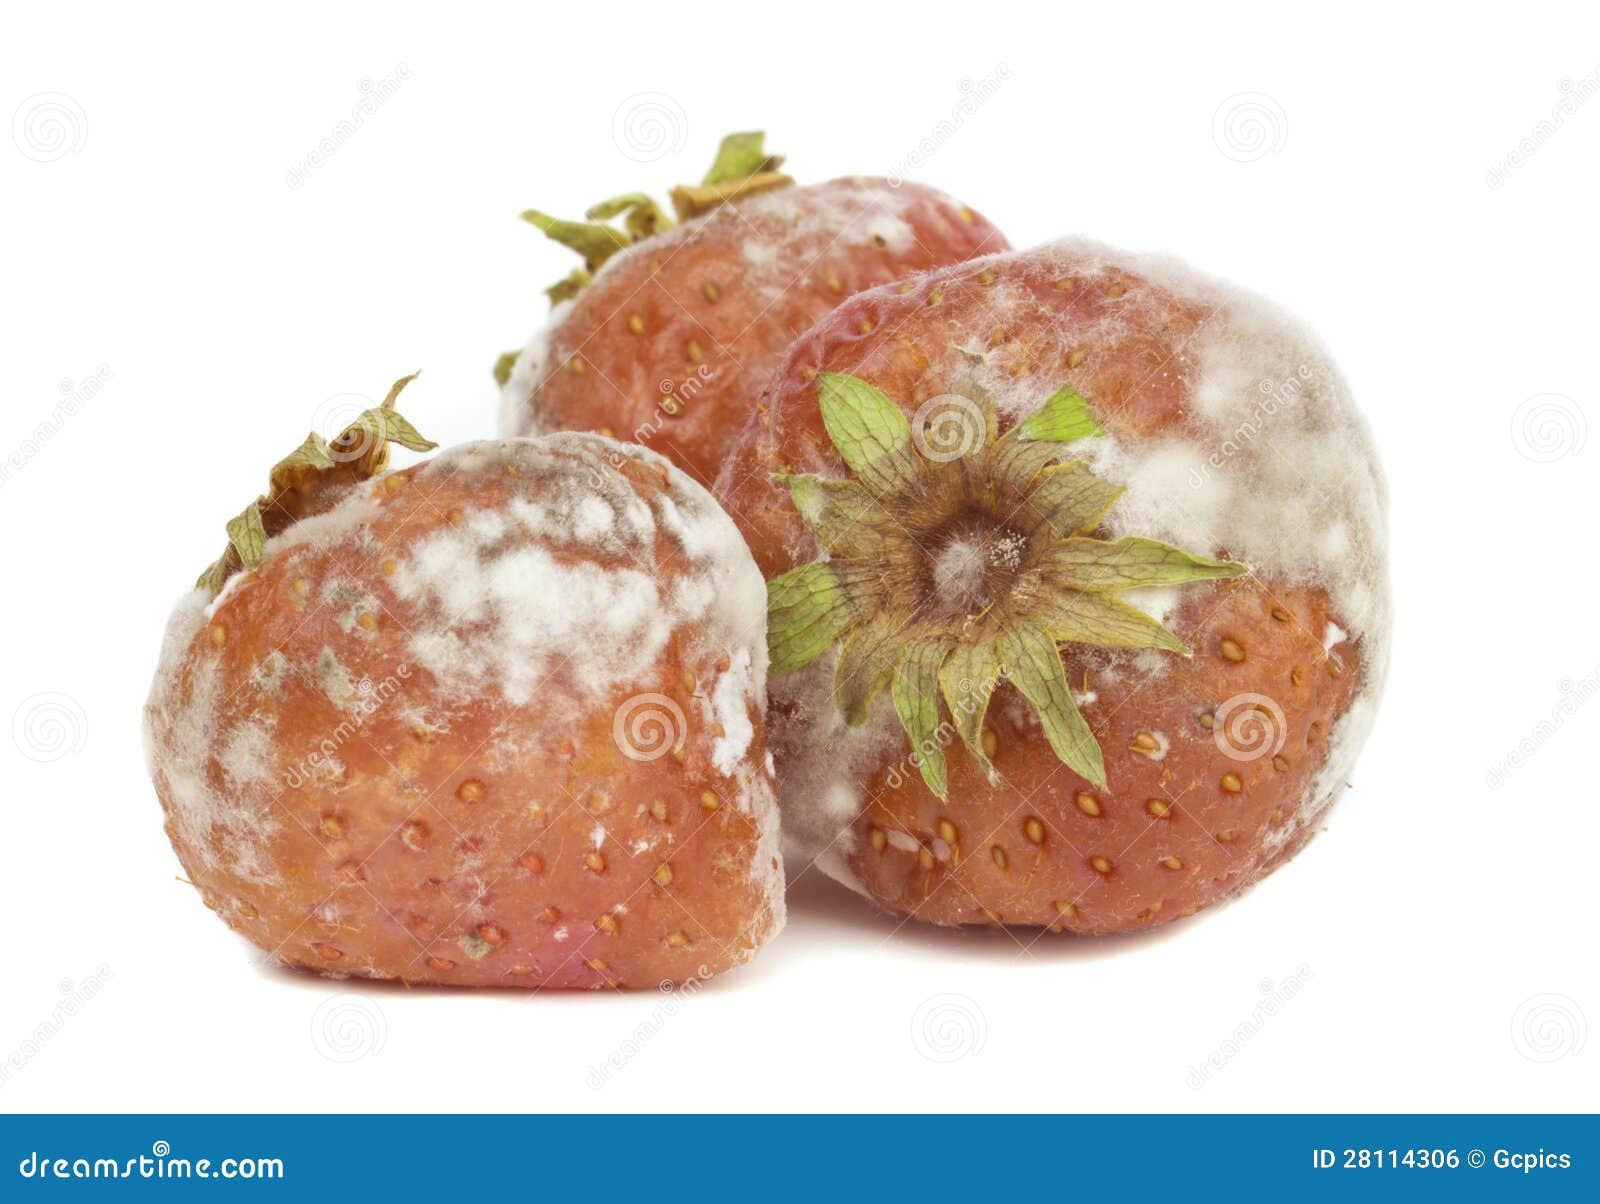 Rotten Strawberries Rotten Mouldy Strawberries